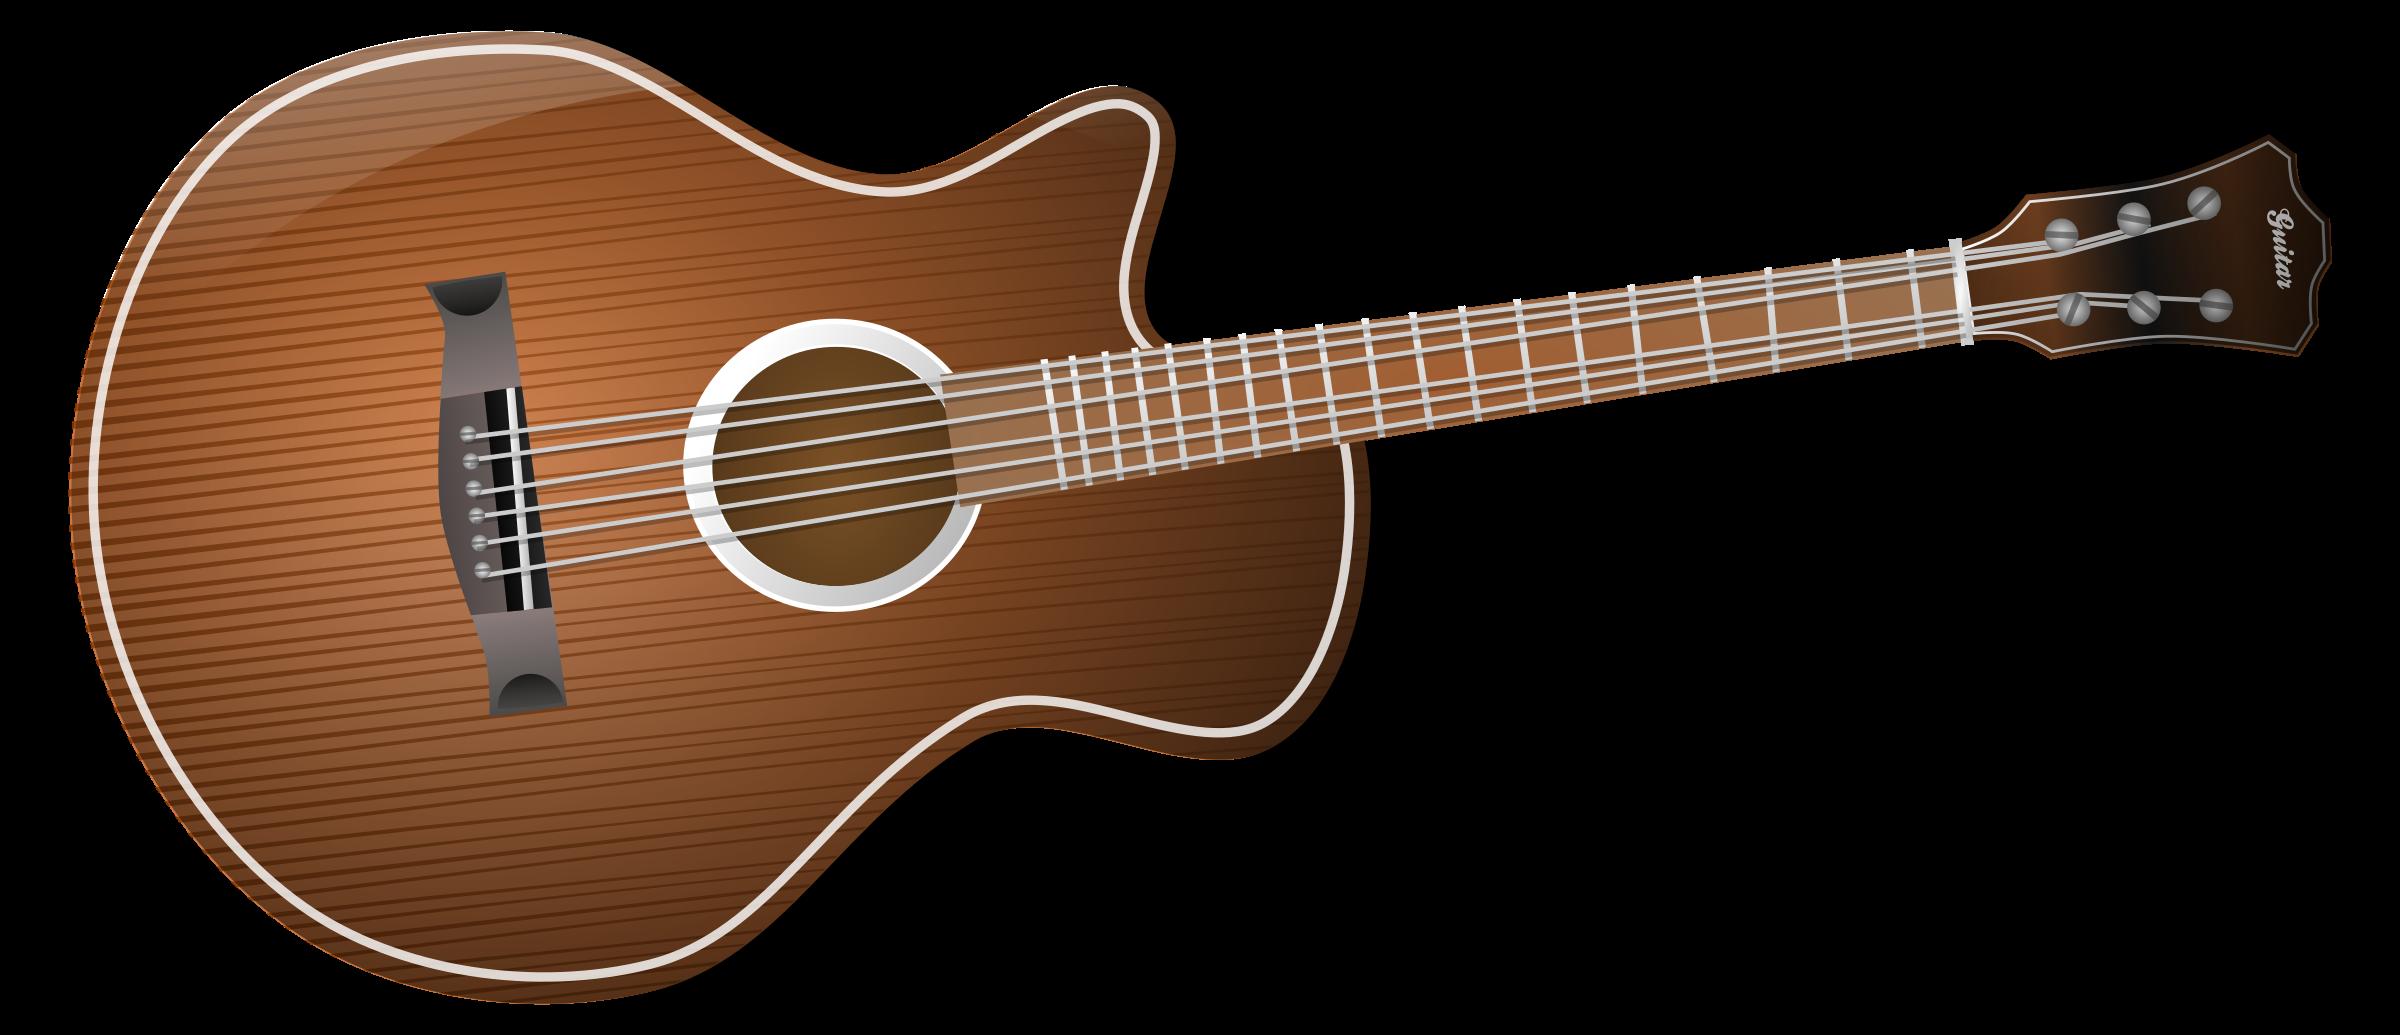 Big image png. Clipart guitar cool guitar